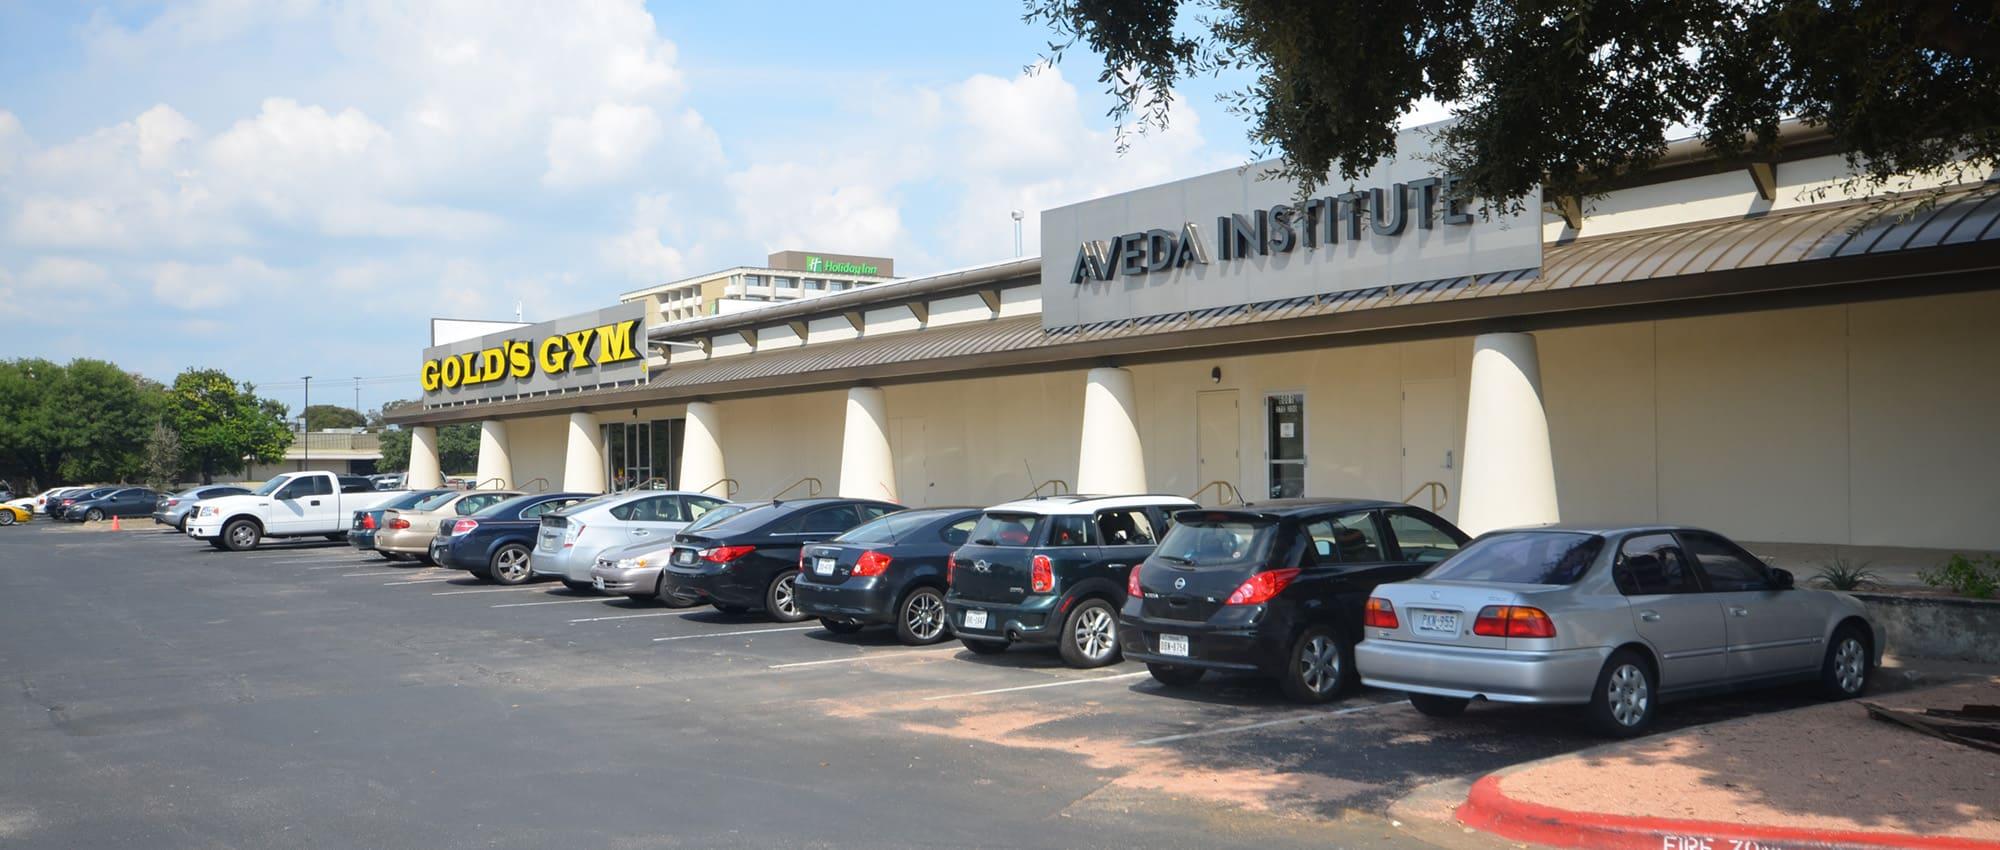 6001 Middlefiskville | Retail Renovation in Austin, Texas